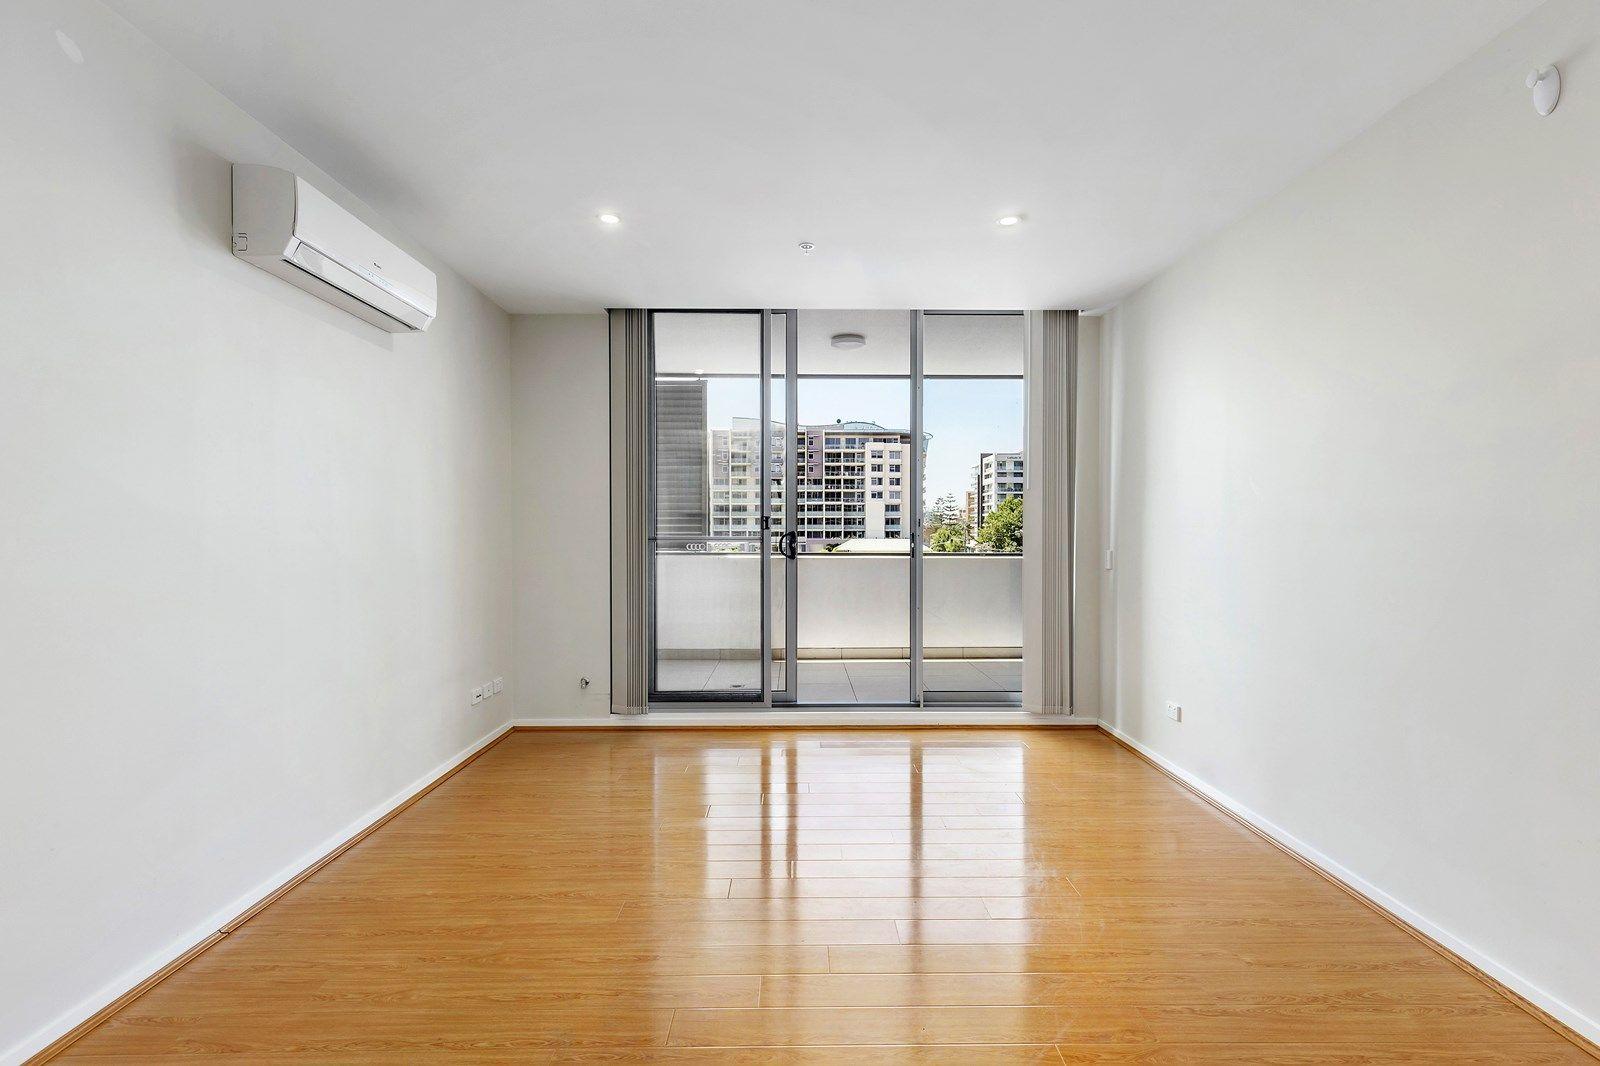 306/47-51 Crown Street, Wollongong NSW 2500, Image 2